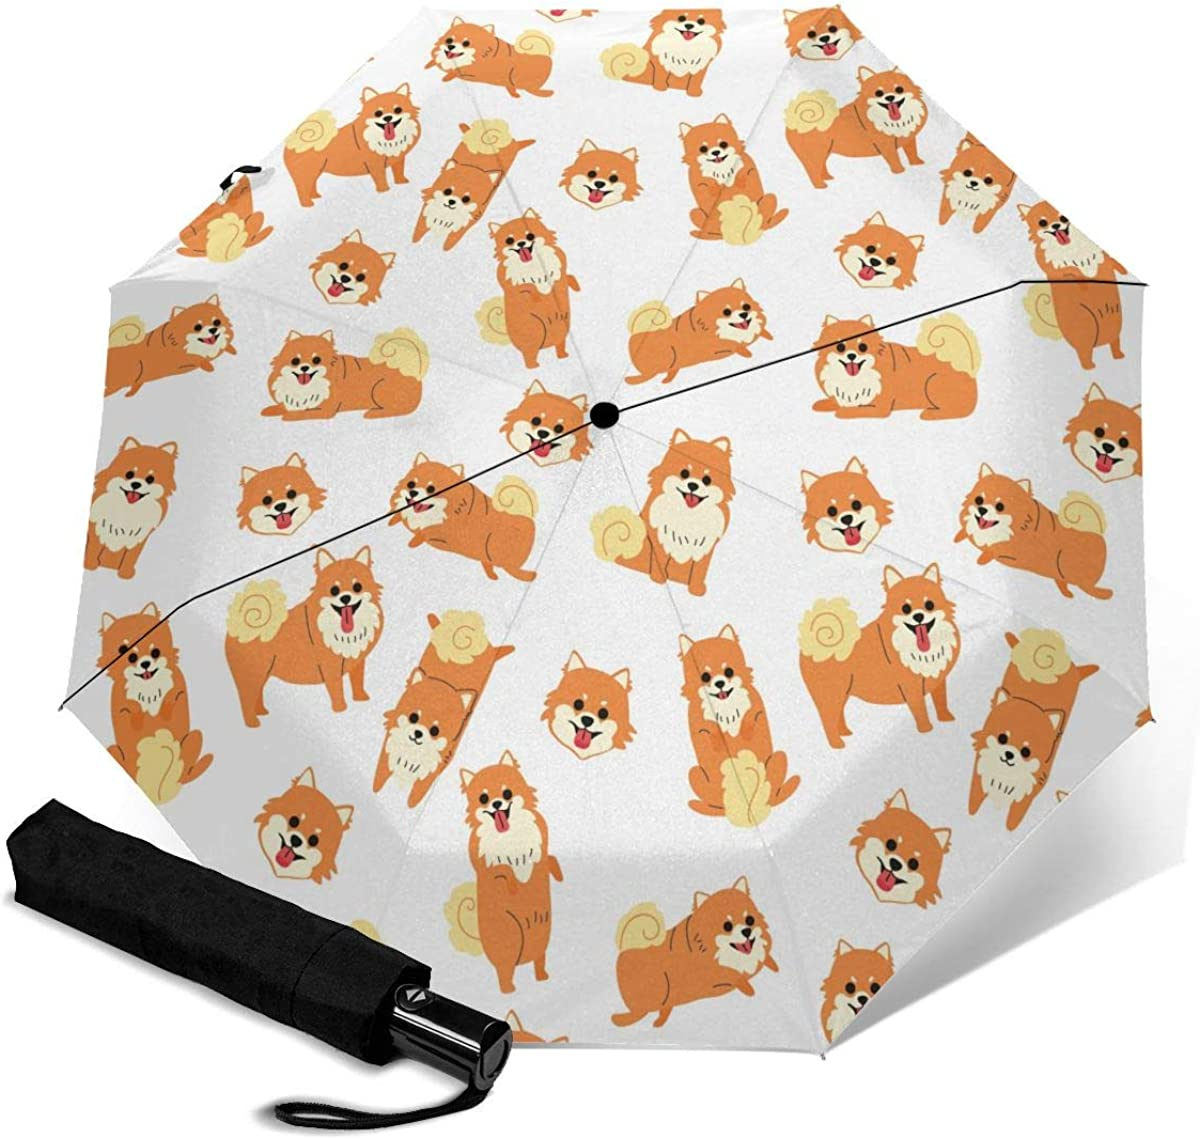 Cute Pomeranian Dog Umbrellas for Auto Excellent New sales Color-Changing rain Umbre